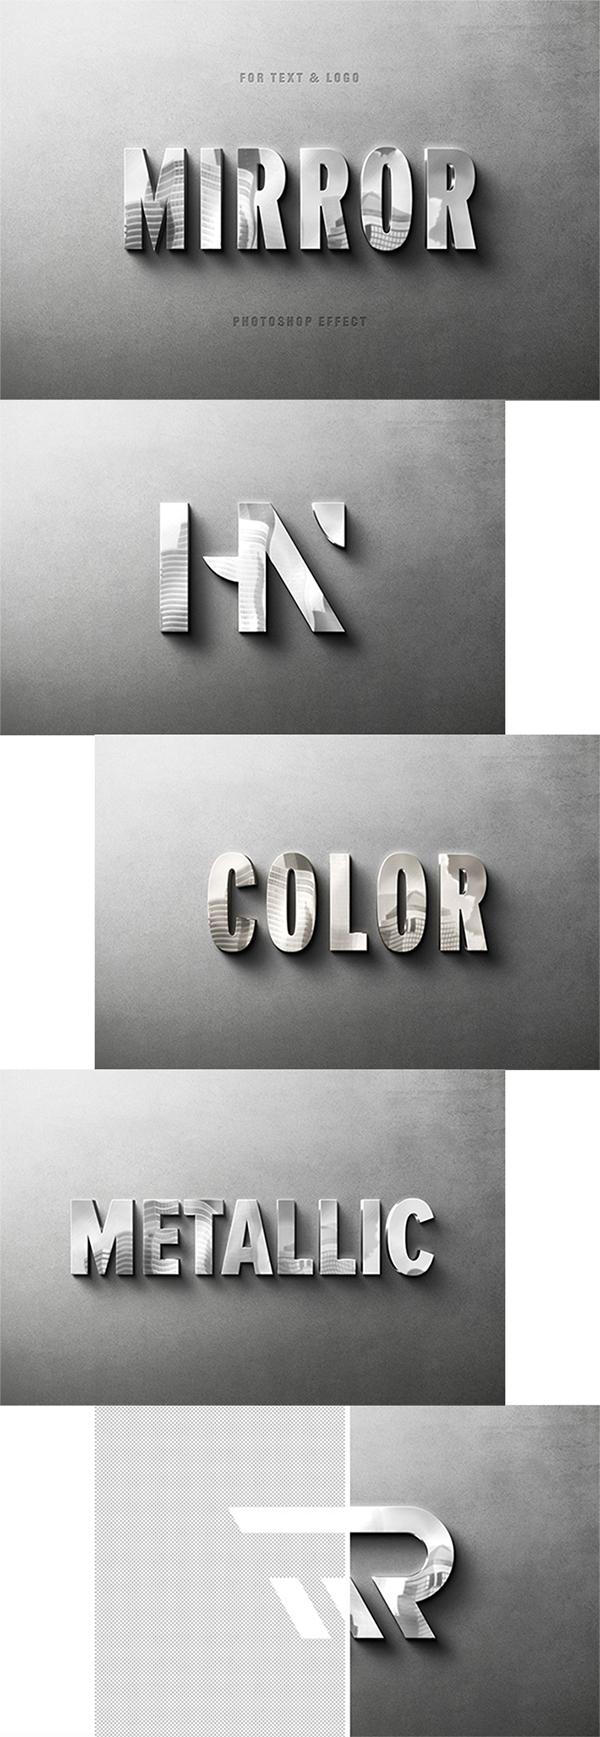 Free Awesome Metallic Photoshop Text Effect (Logo Mockup)